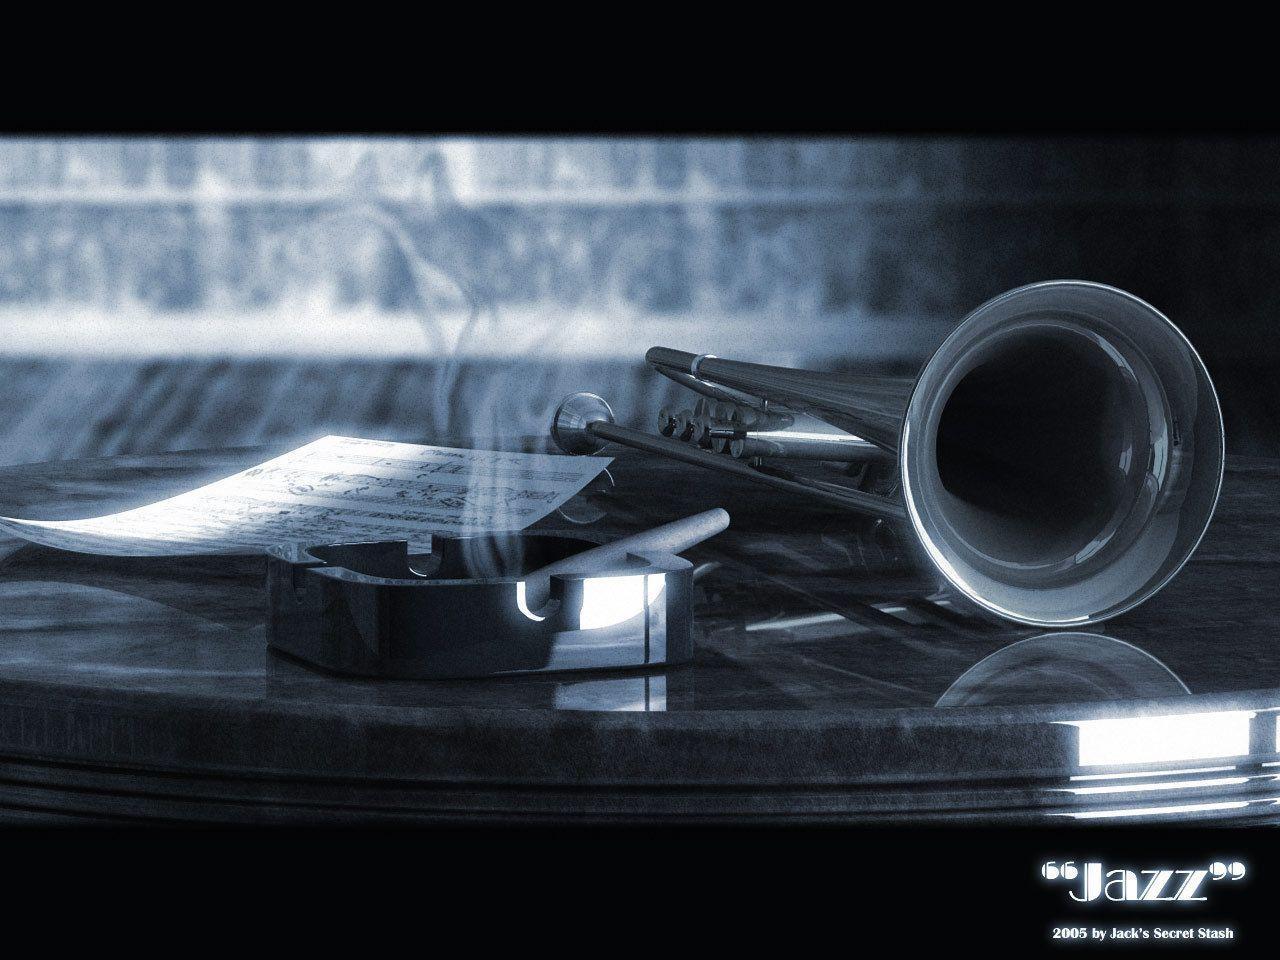 Jazz - Jazz Wallpaper (4052048) - Fanpop